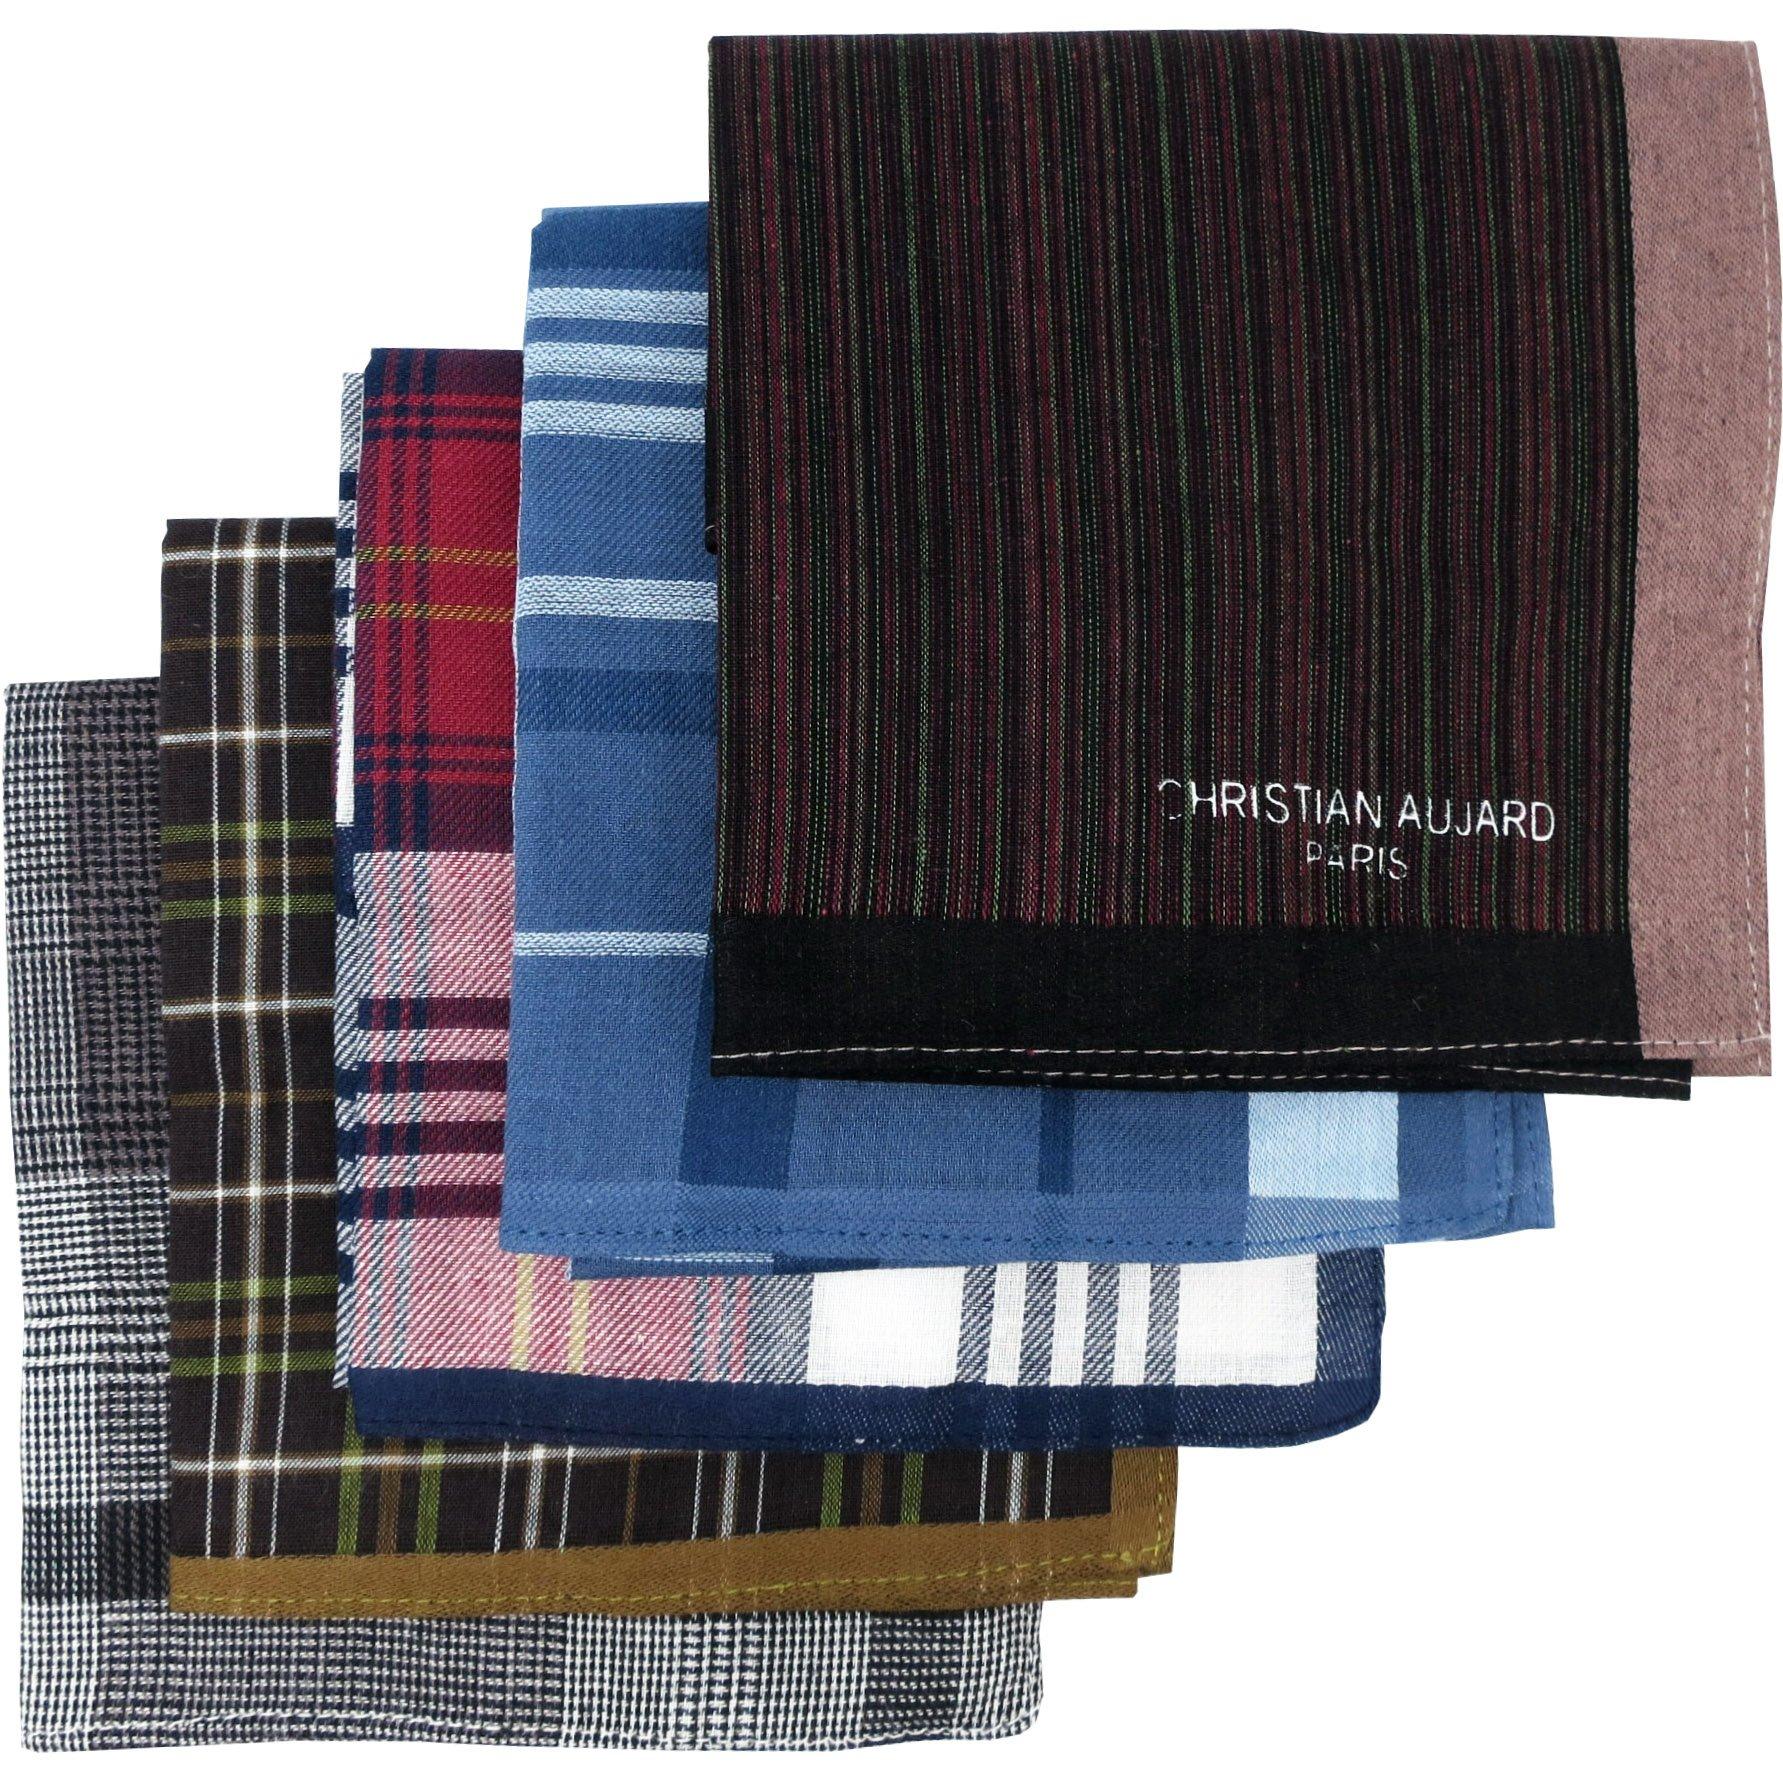 LEEVO Handkerchief Men Assorted Woven Cotton 100% Hankies Fashion 5pack Bulk Value Pack (17.5inch 5pack bulk no.2)